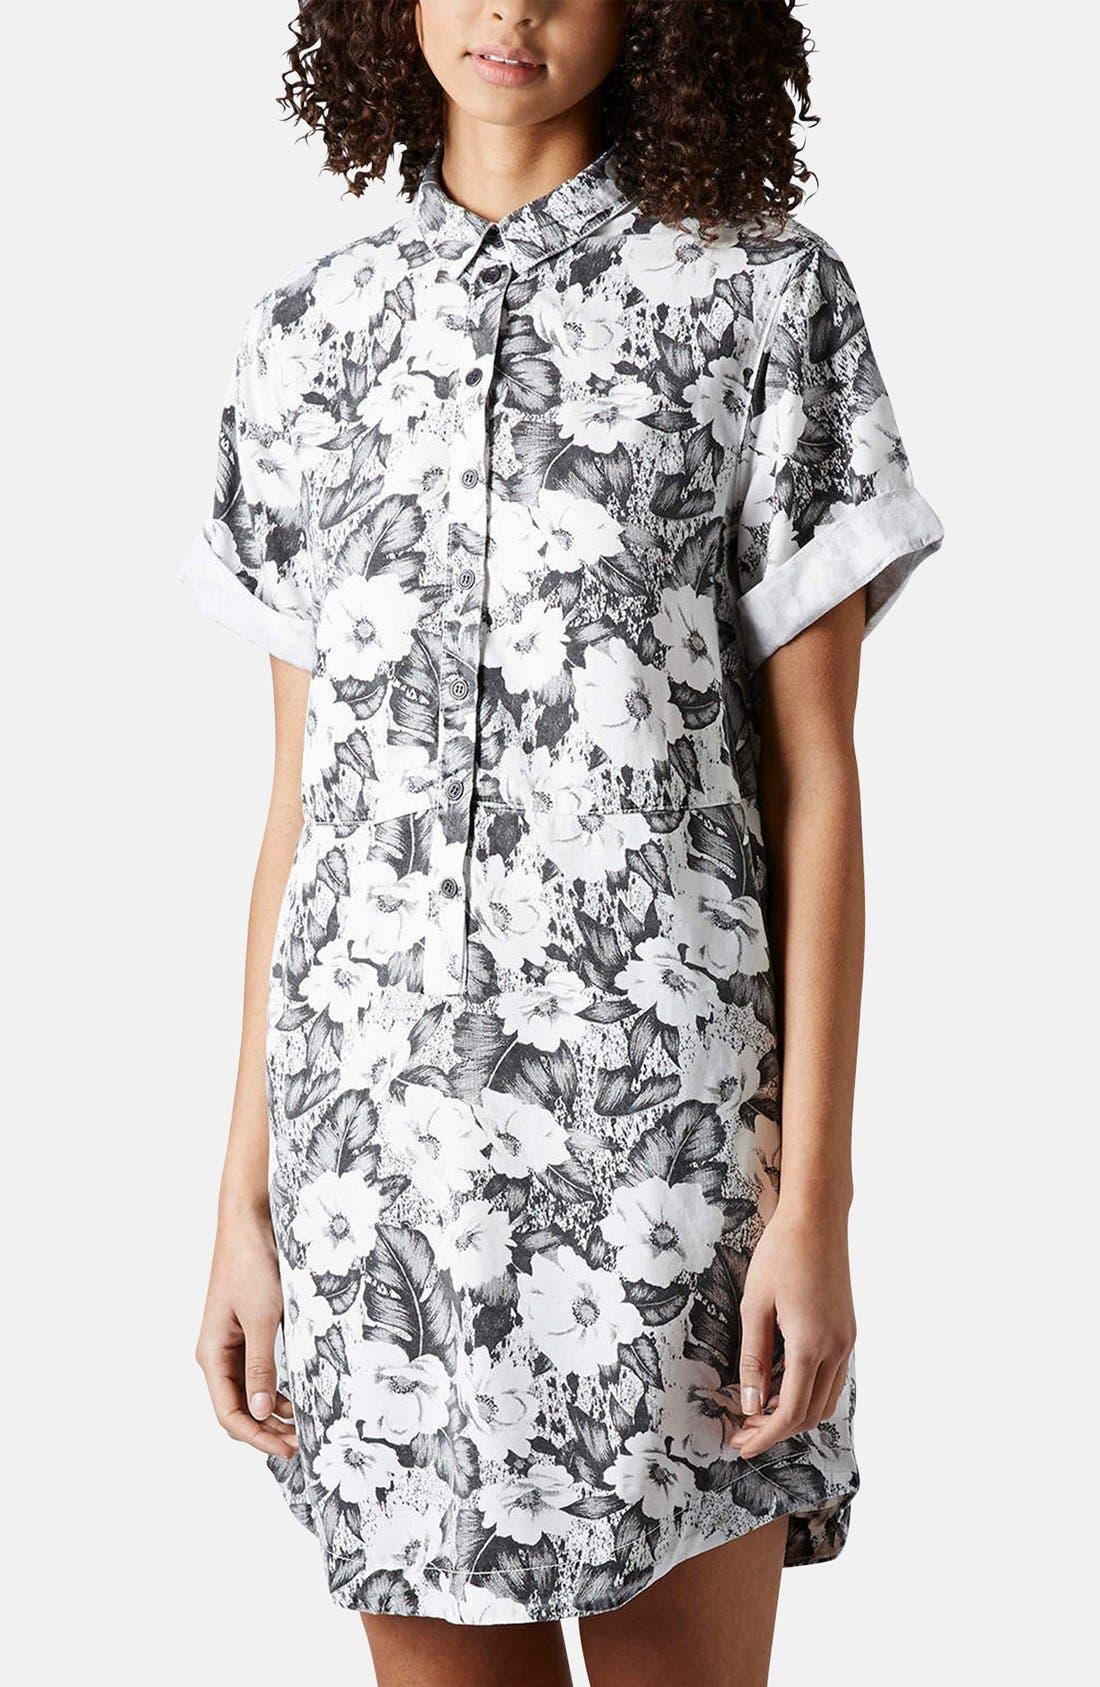 Main Image - Topshop 'Aloha' Print Shirt Dress